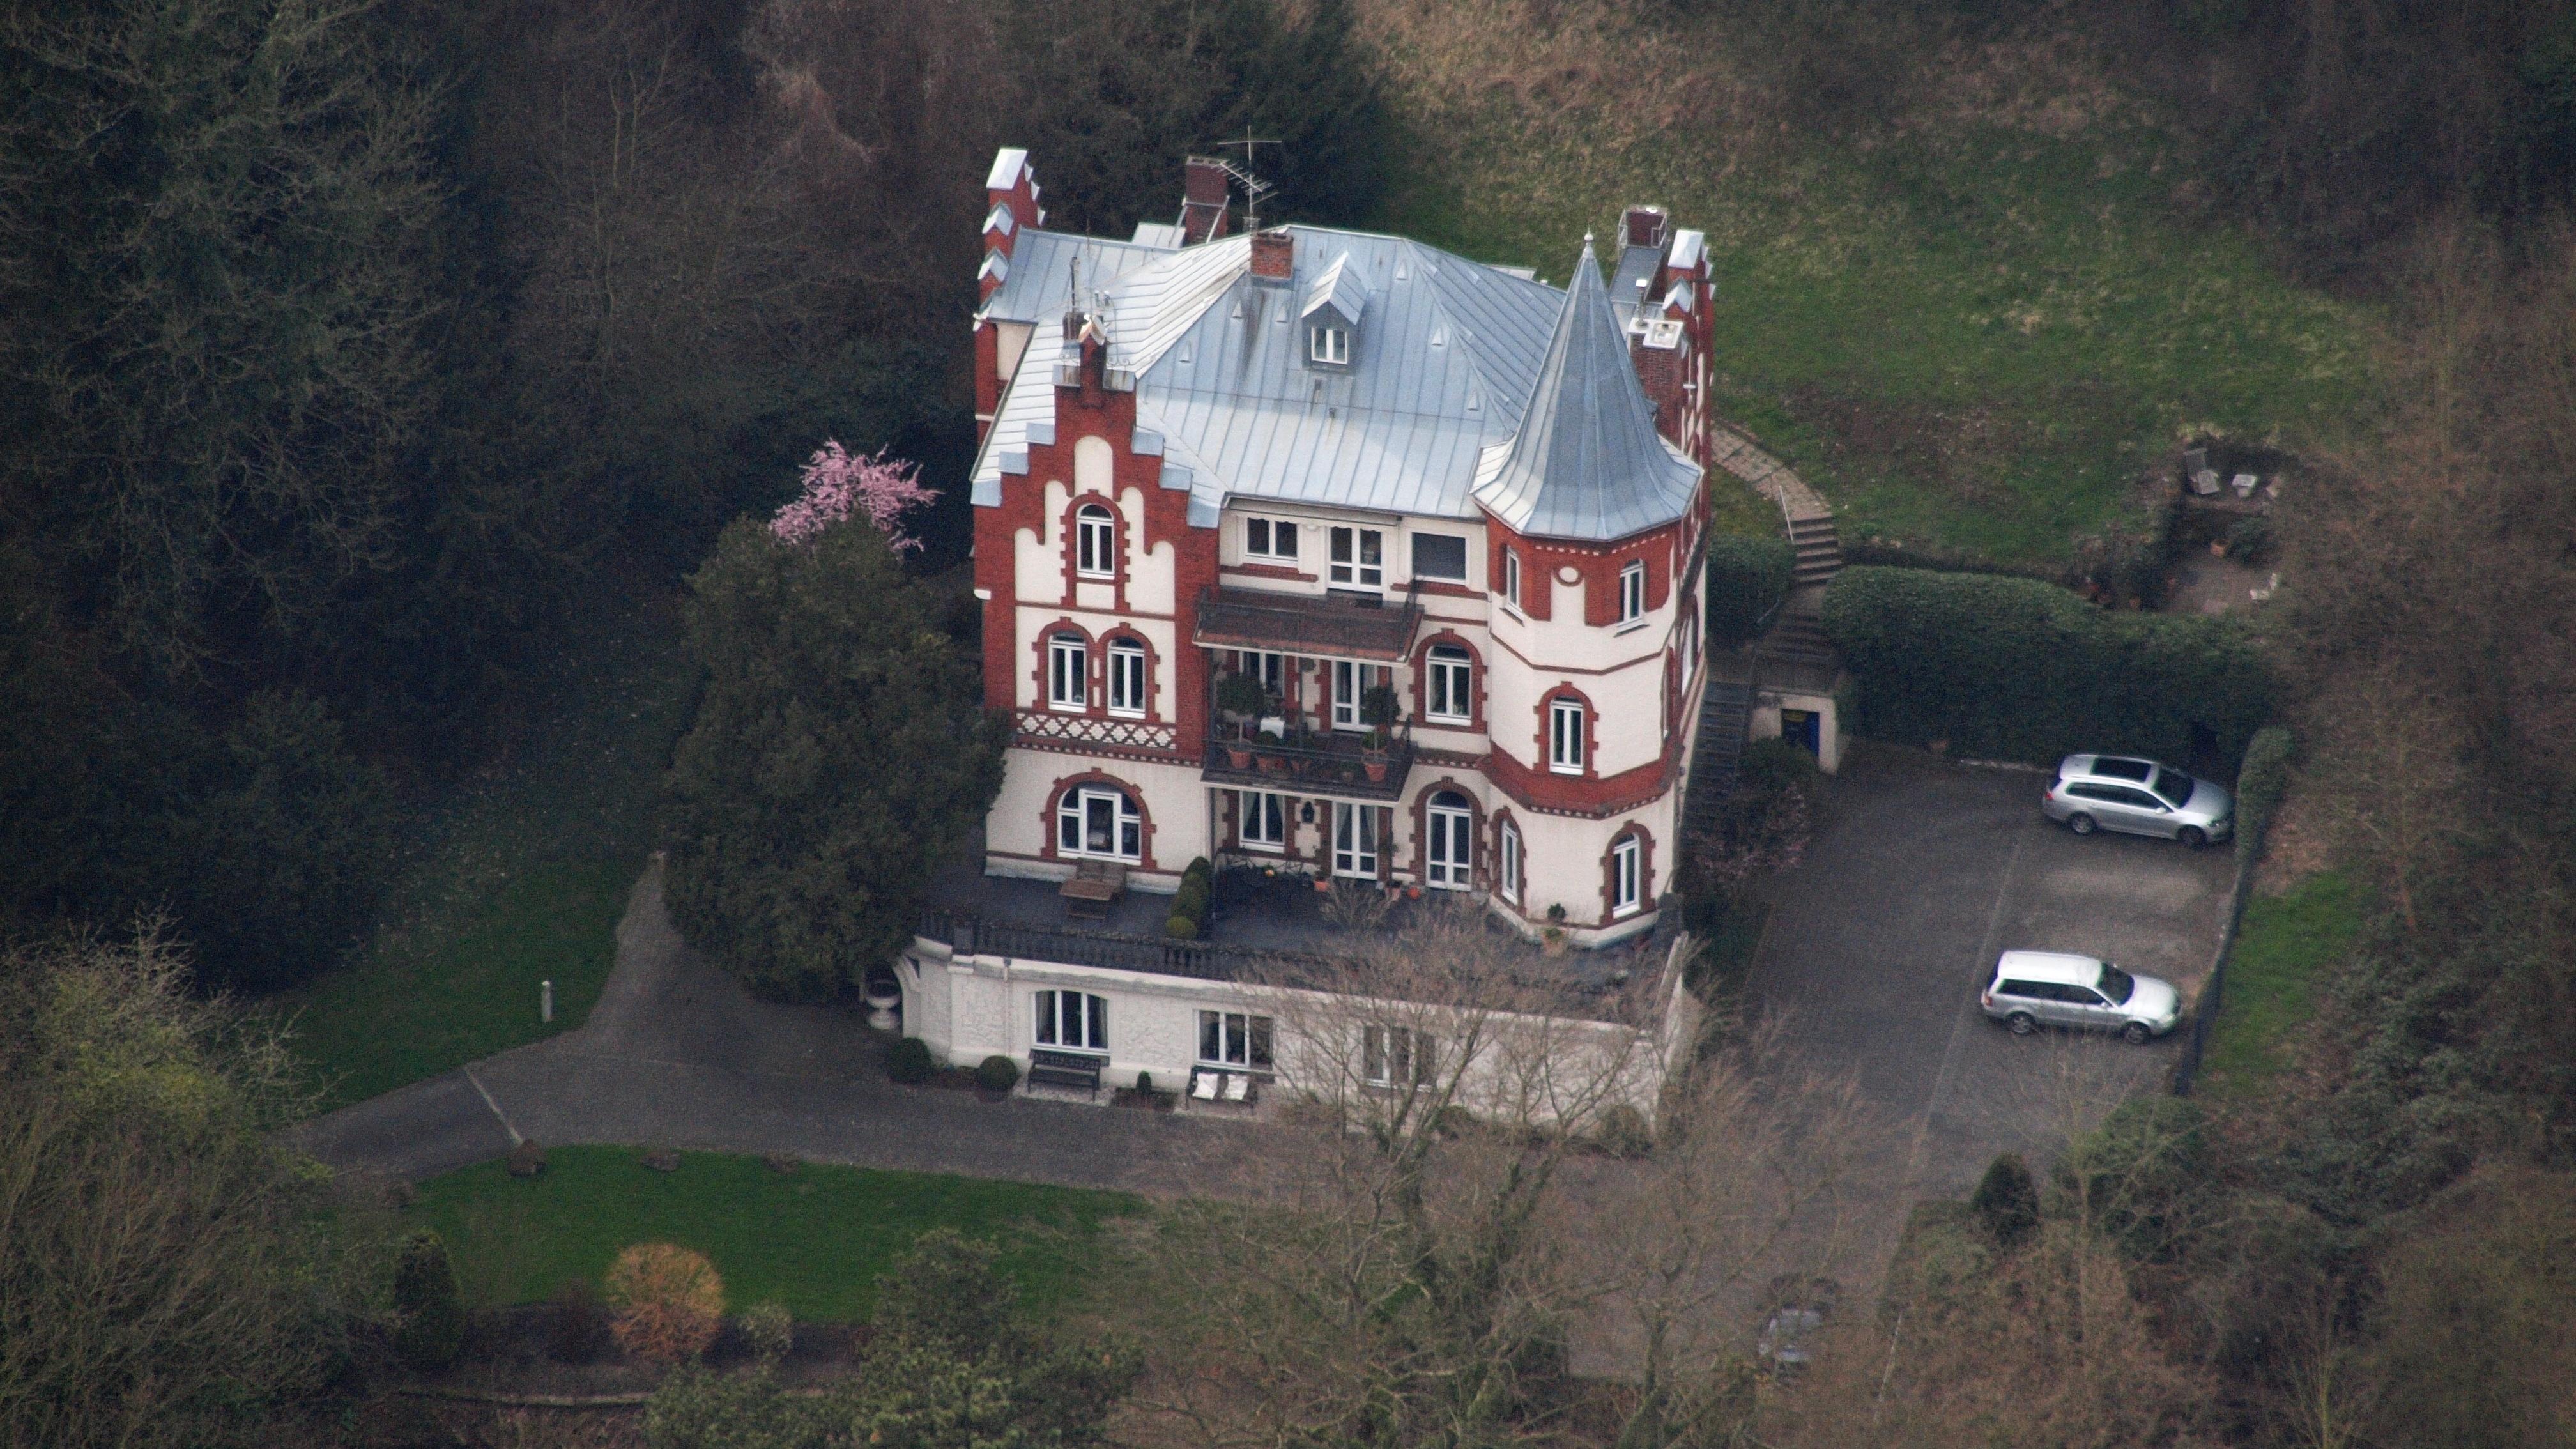 Filebonn Rosenburgweg 26 Villa Kleinbussmann 001jpg Wikimedia